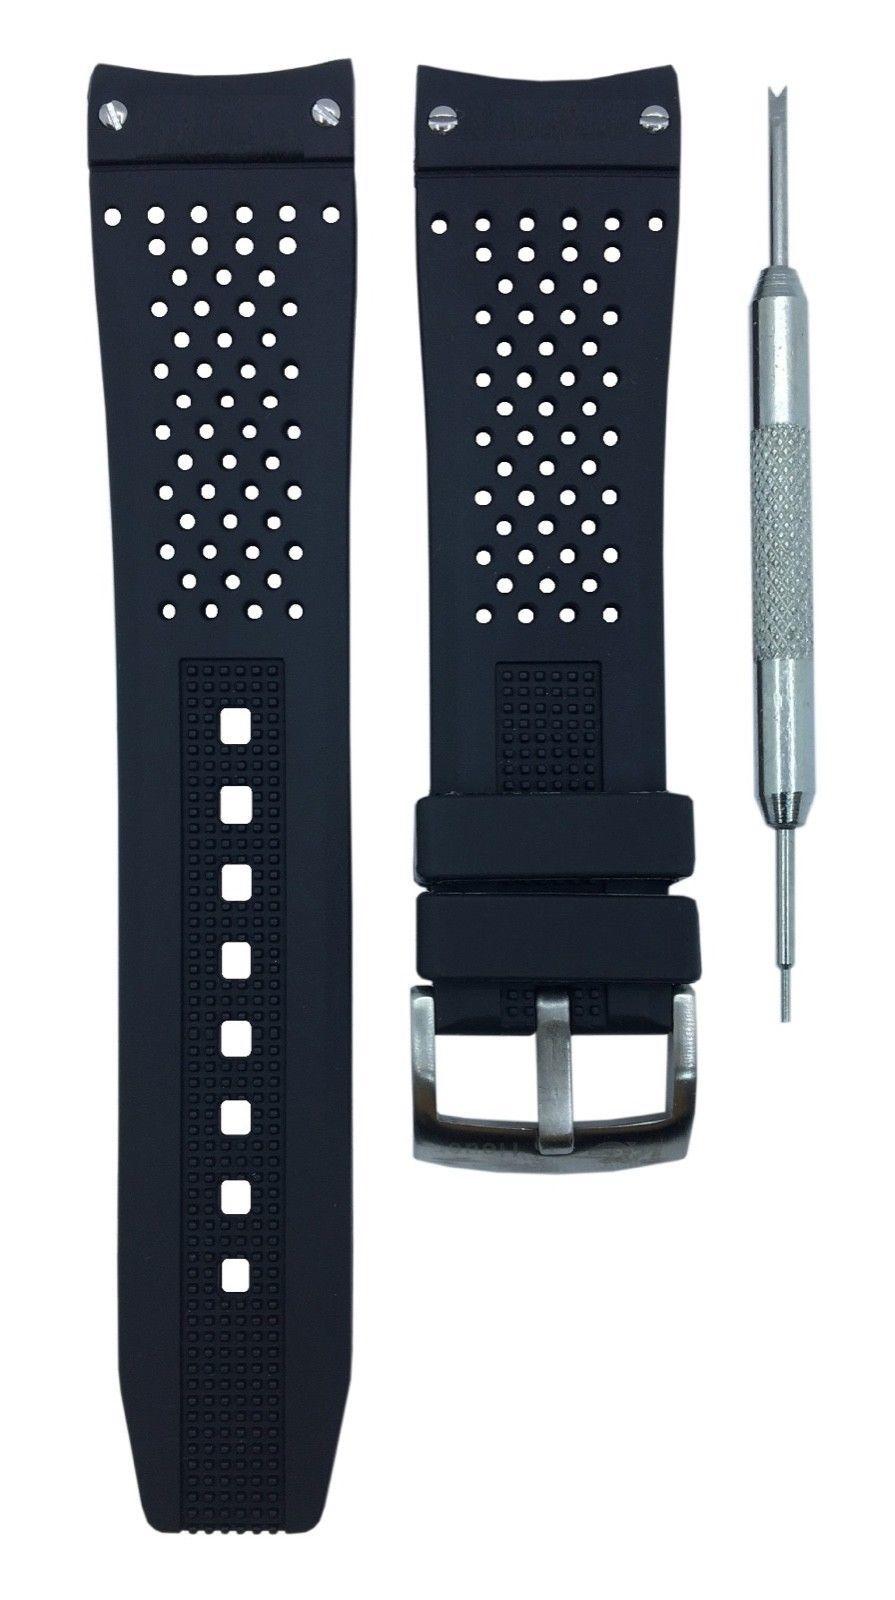 9f9d6507e41 57. 57. Previous. Bracelet FOR TAG Heuer rubber Grand Carrera band BLACK  noir 22mm w  ...